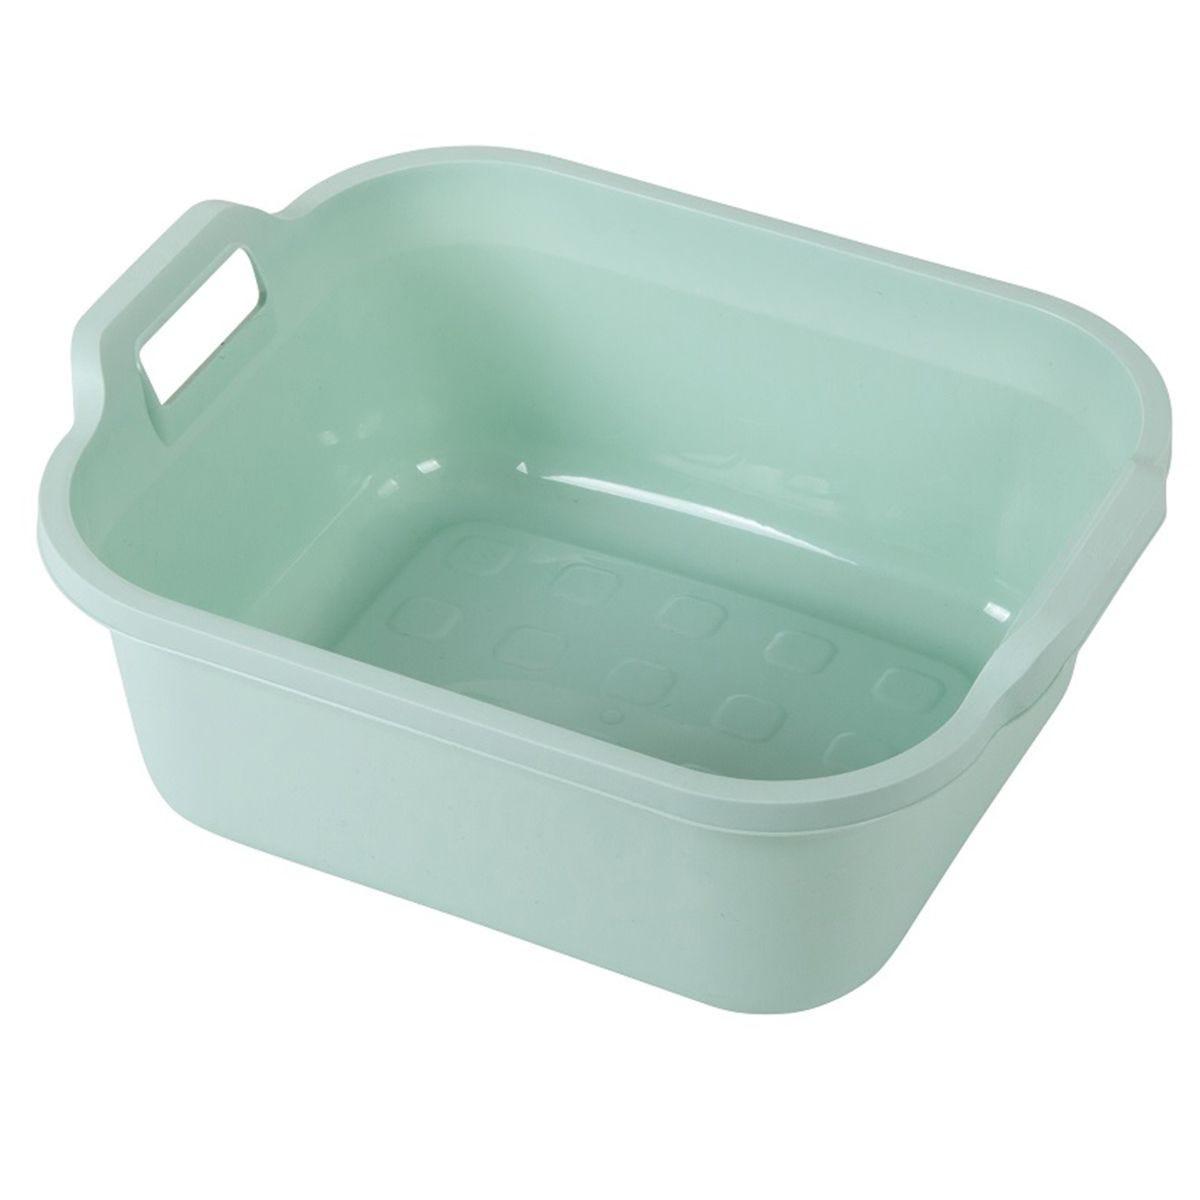 Addis 10L Washing Up Bowl - Blue